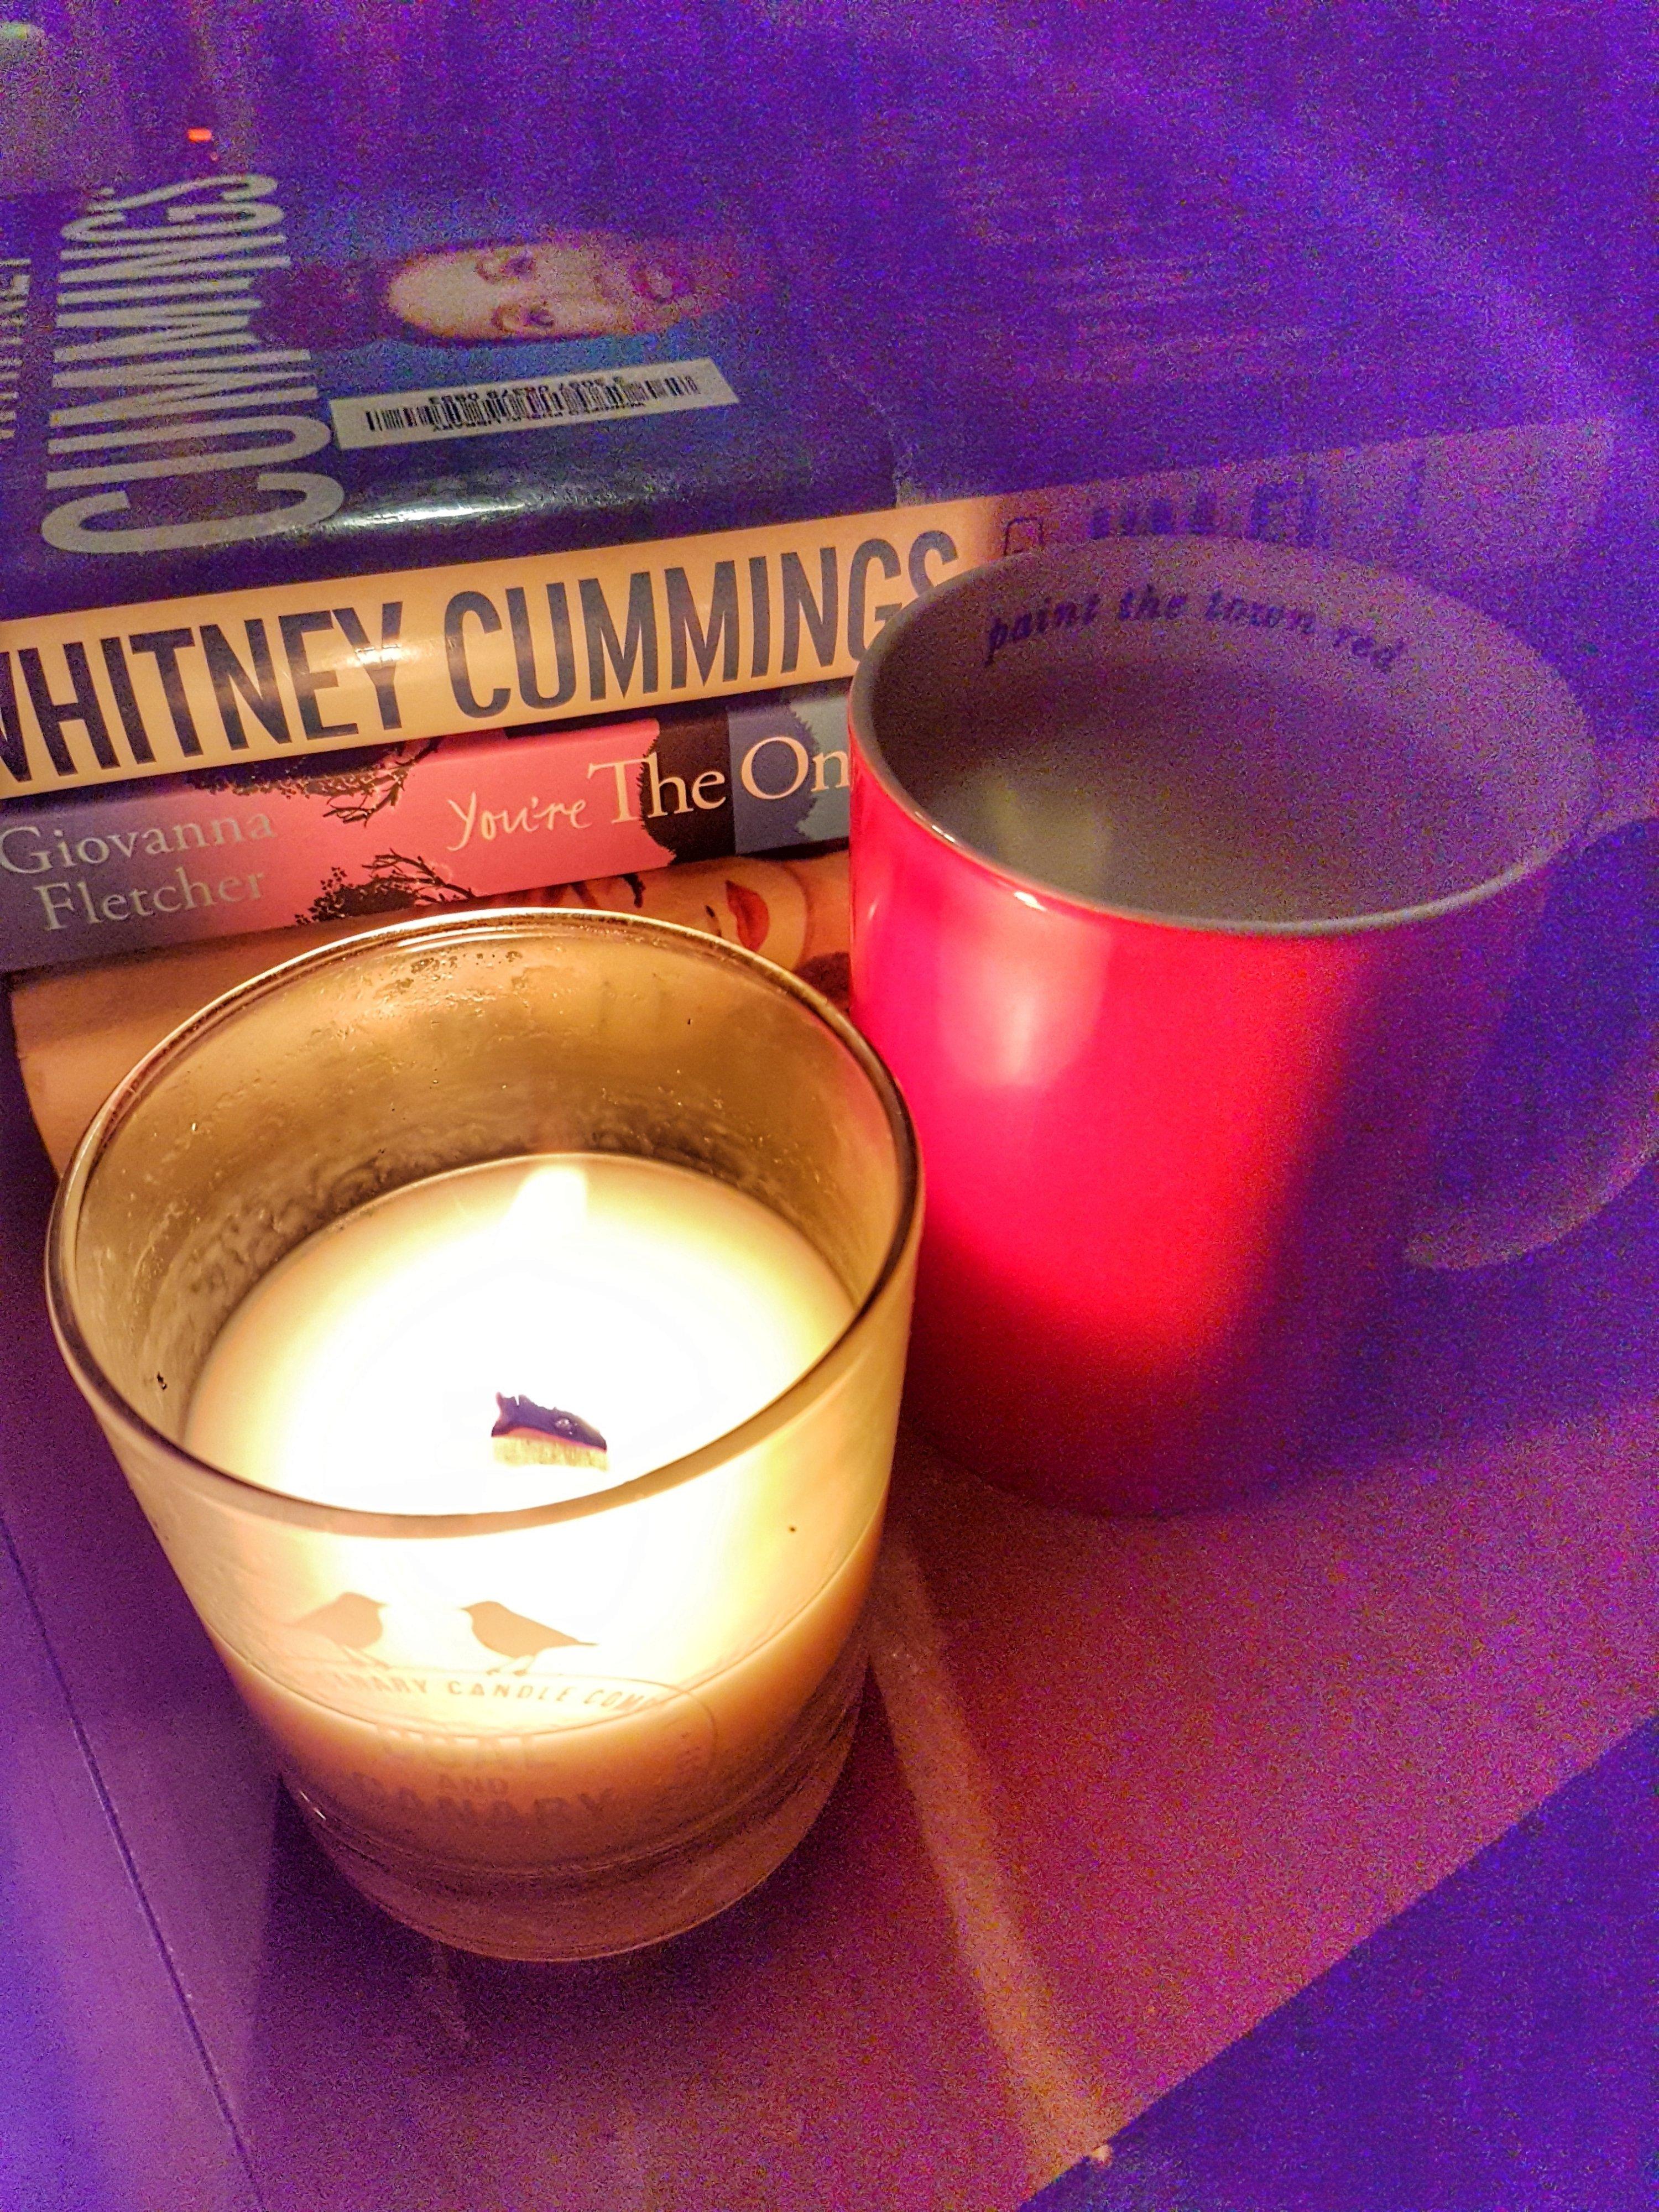 Candle, Book, and Tea.jpeg